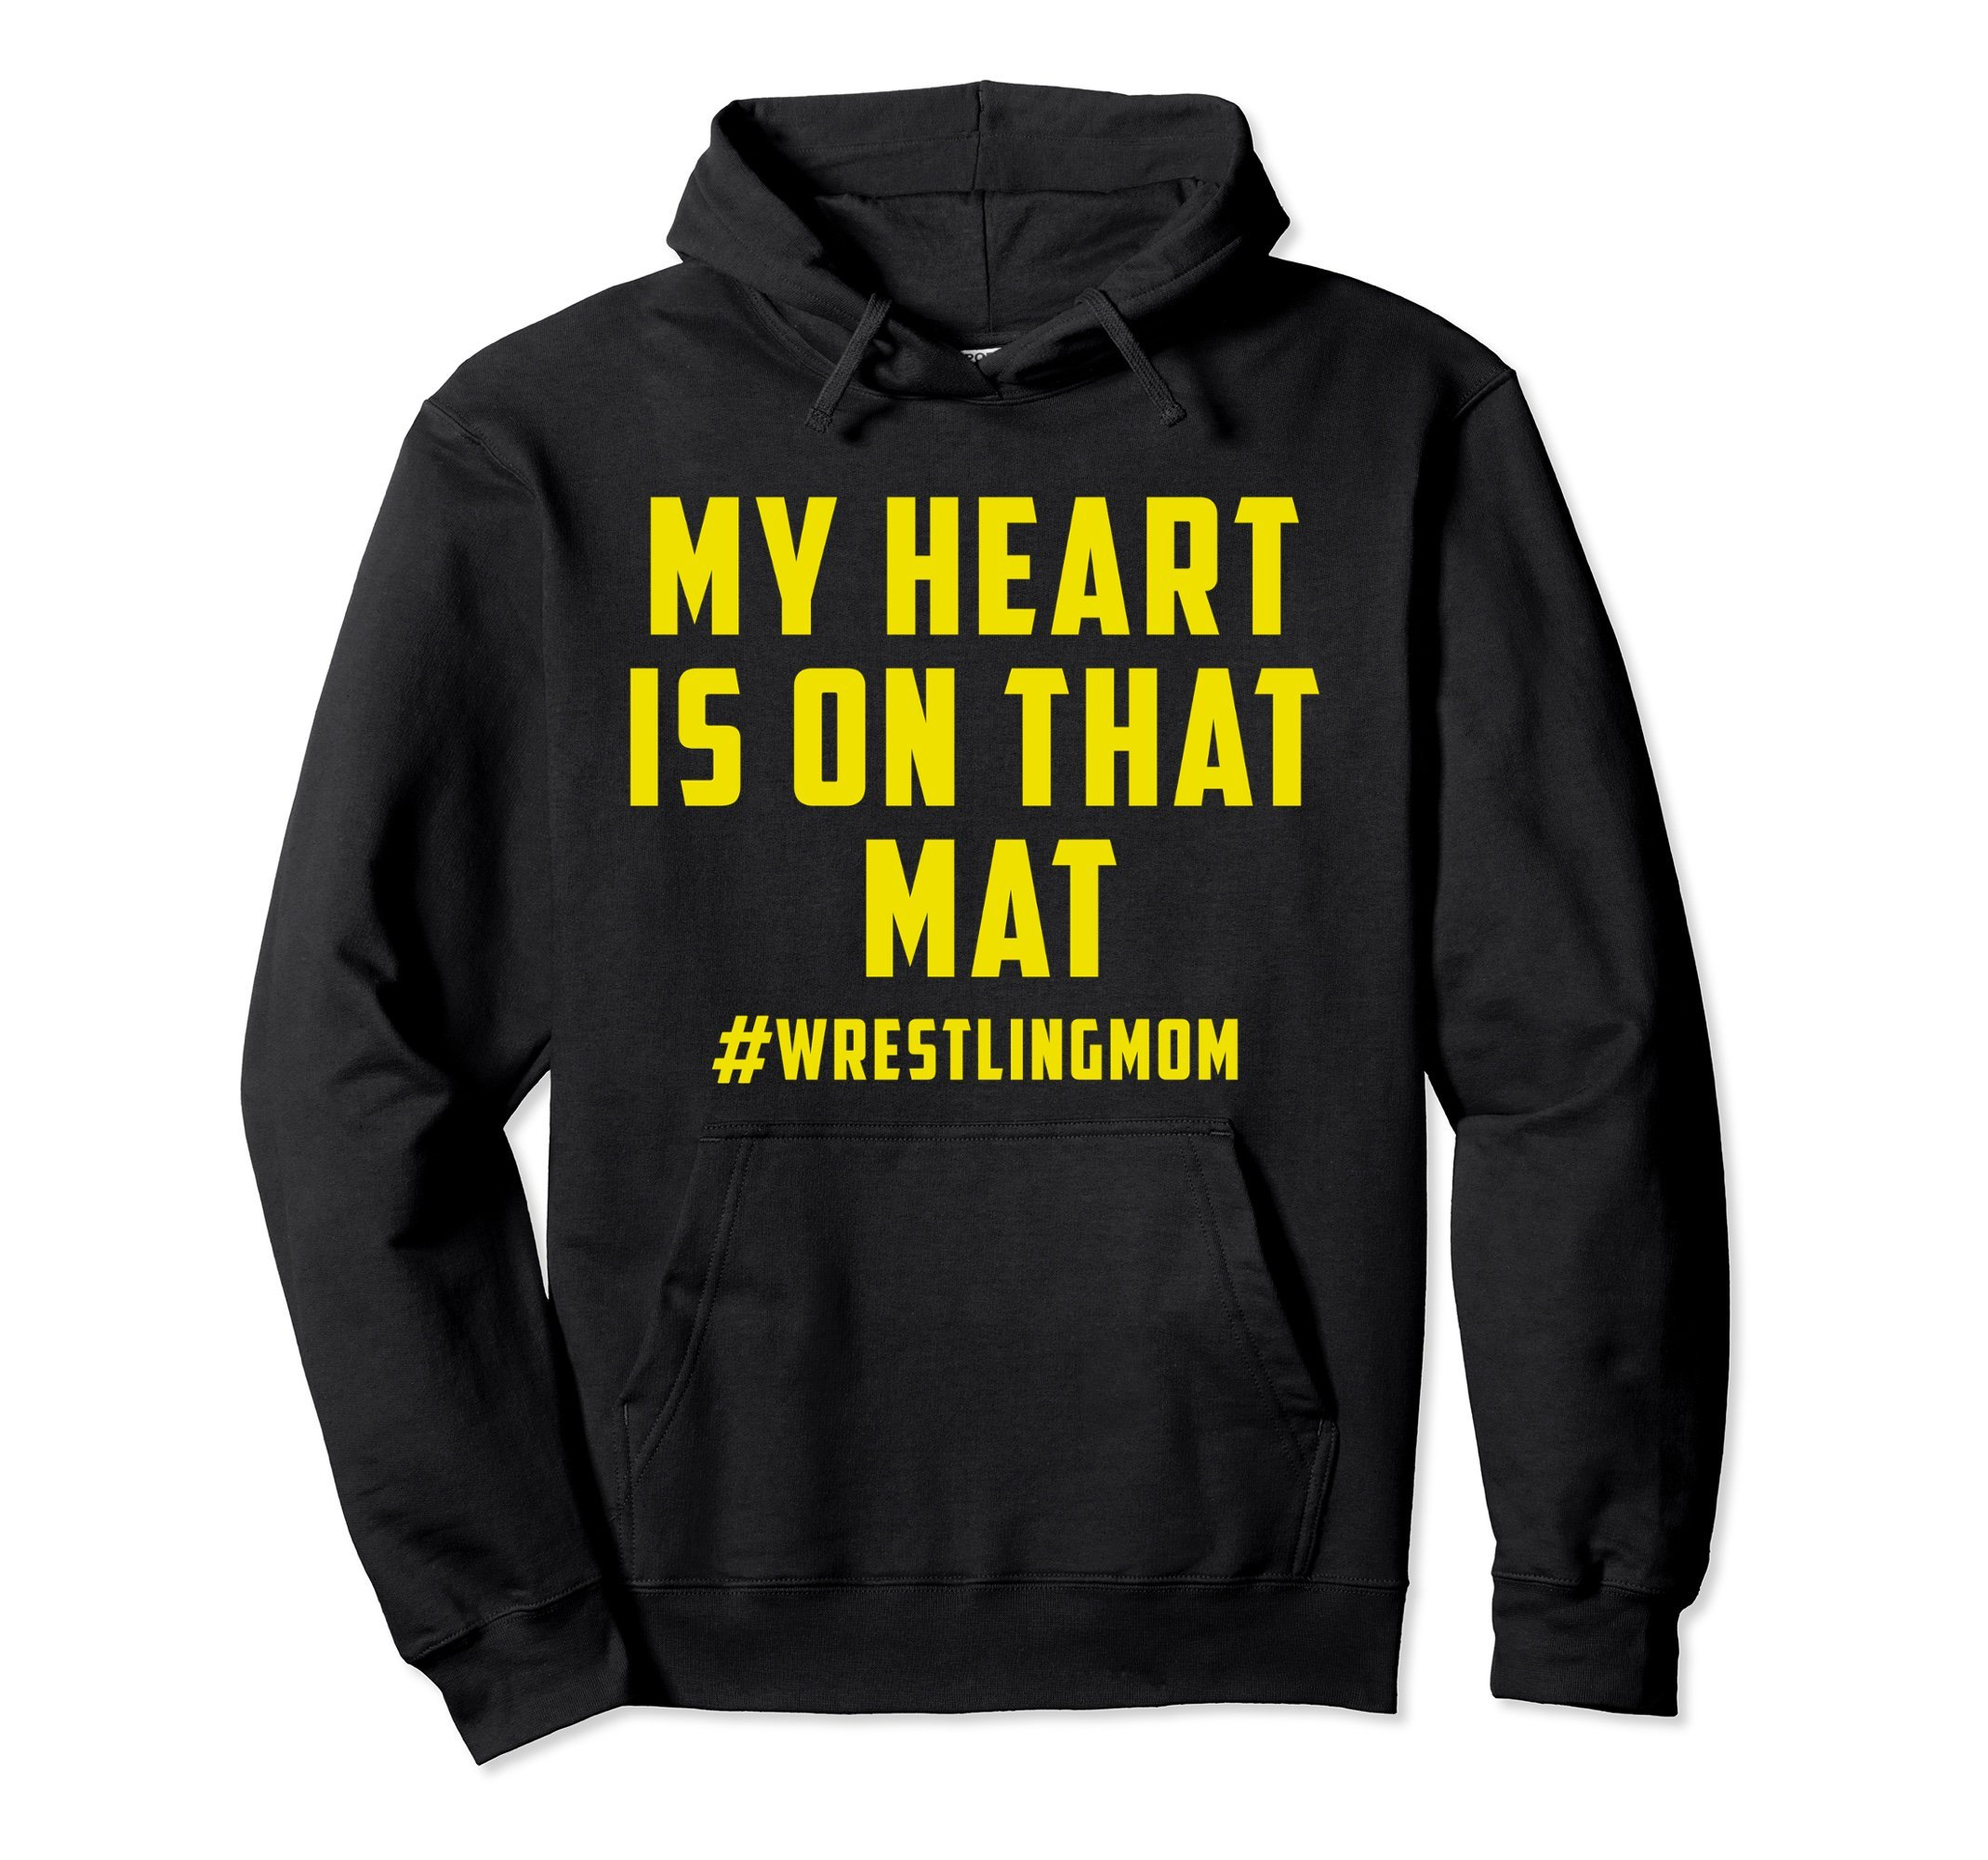 Unisex My Heart Is On That Mat Wrestling Mom Hoodie 2XL Black by My Heart Is On That Mat Hoodie